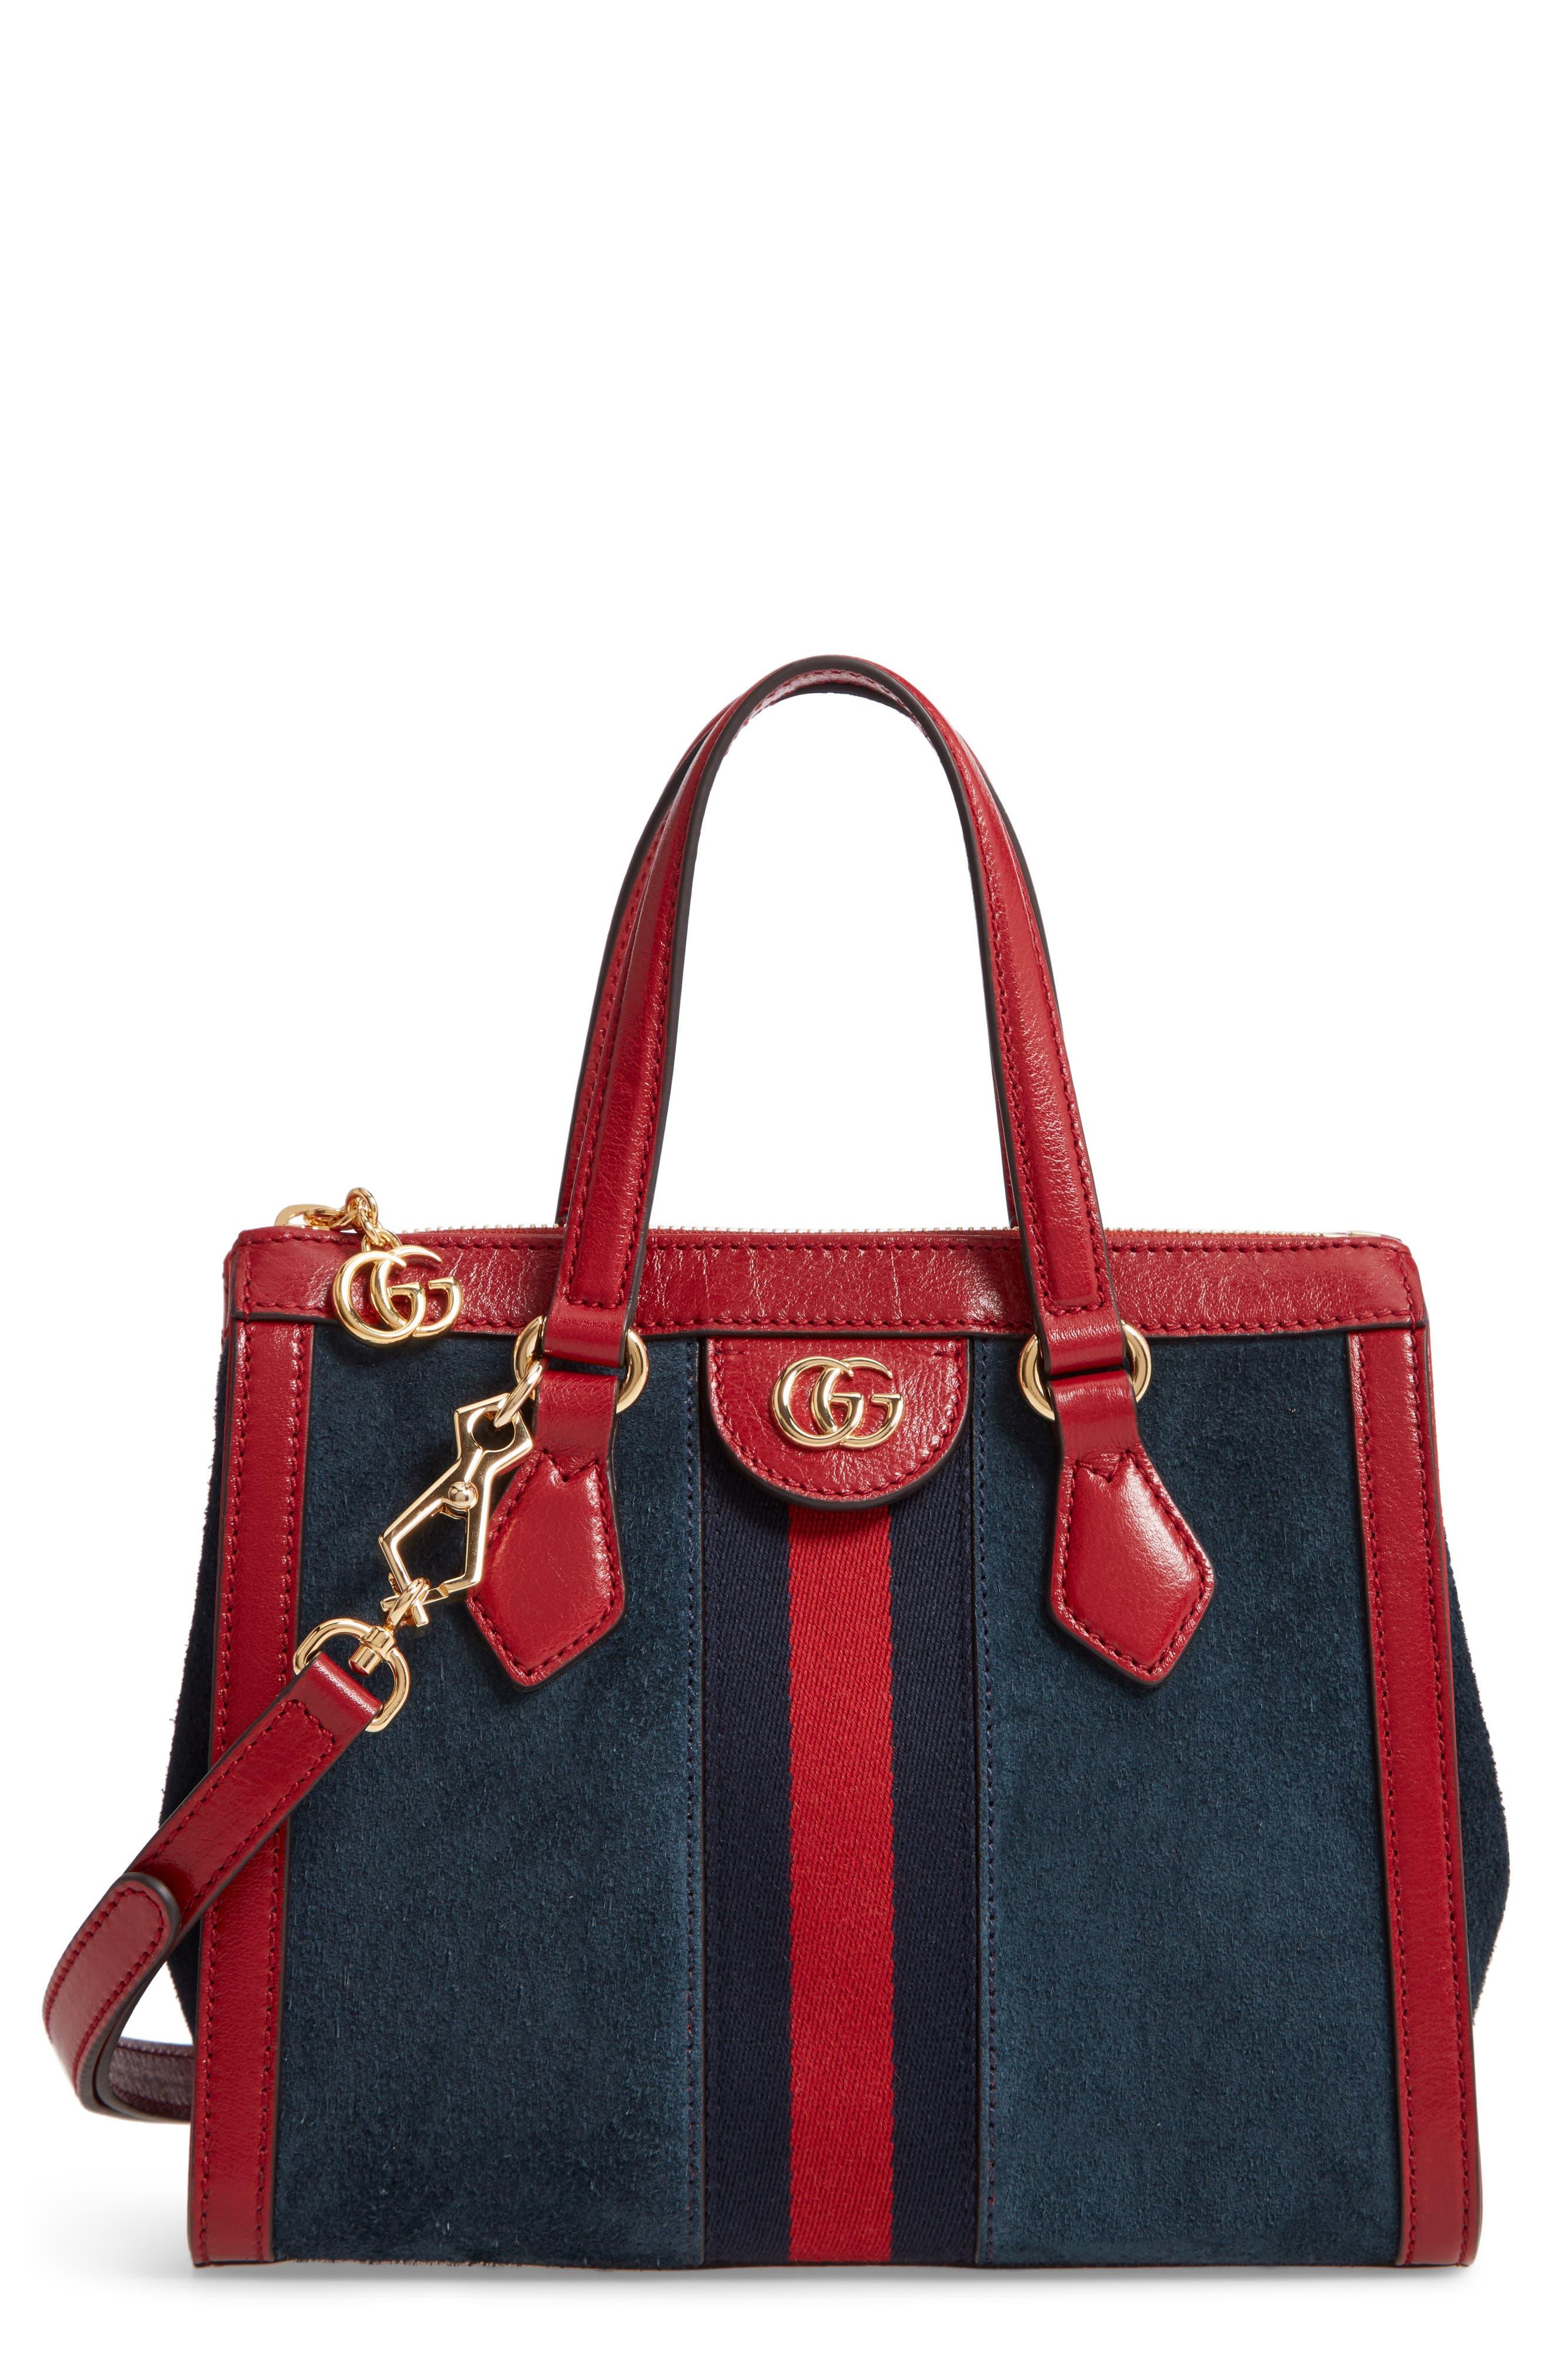 dress - Designer gucci handbags for women video